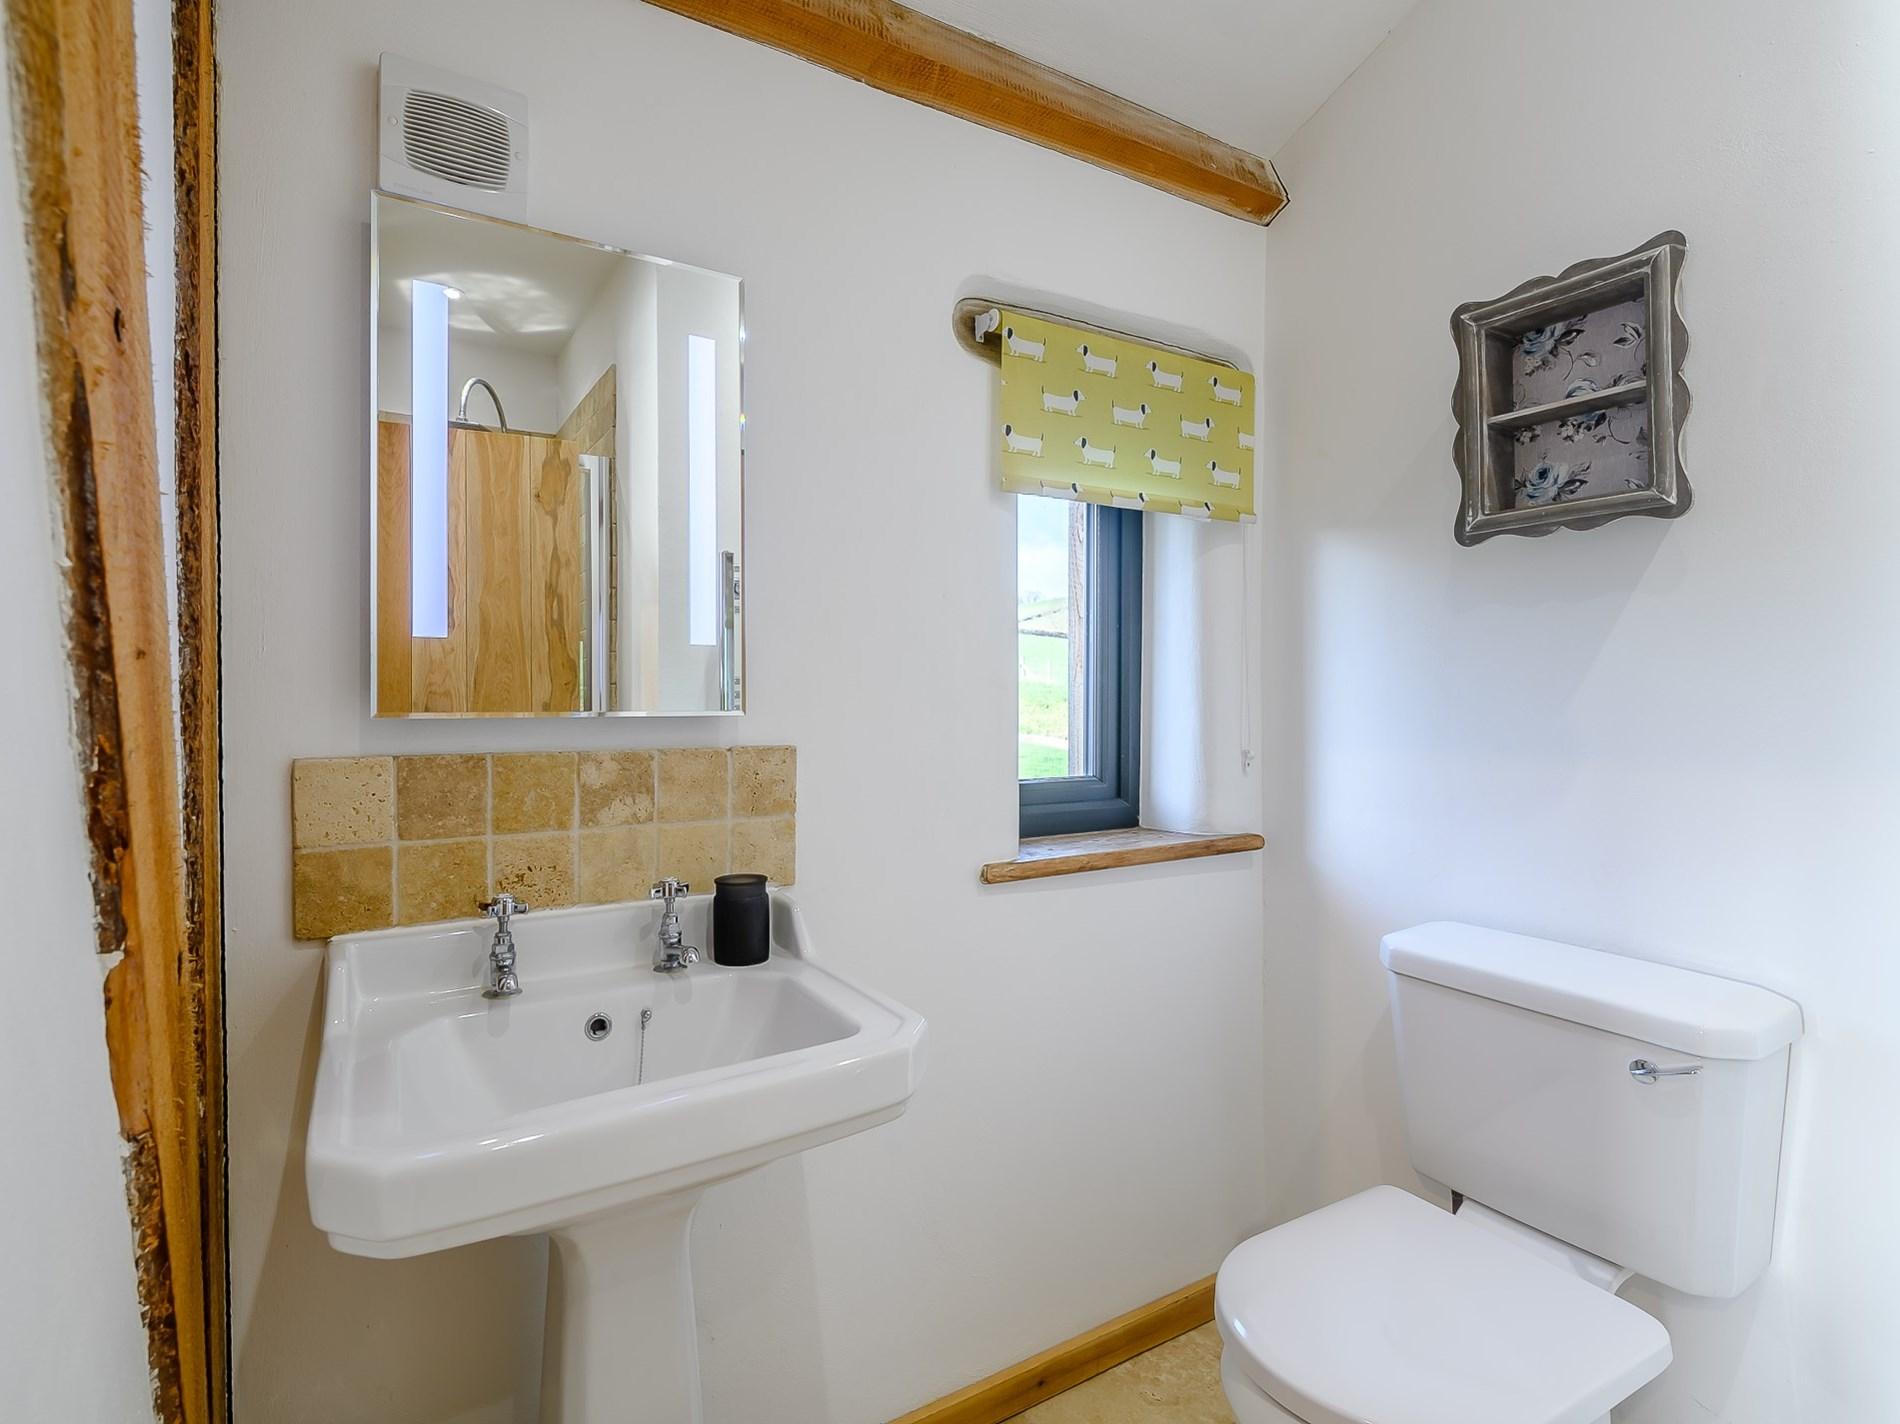 5 Bedroom Cottage in Tiverton, Devon